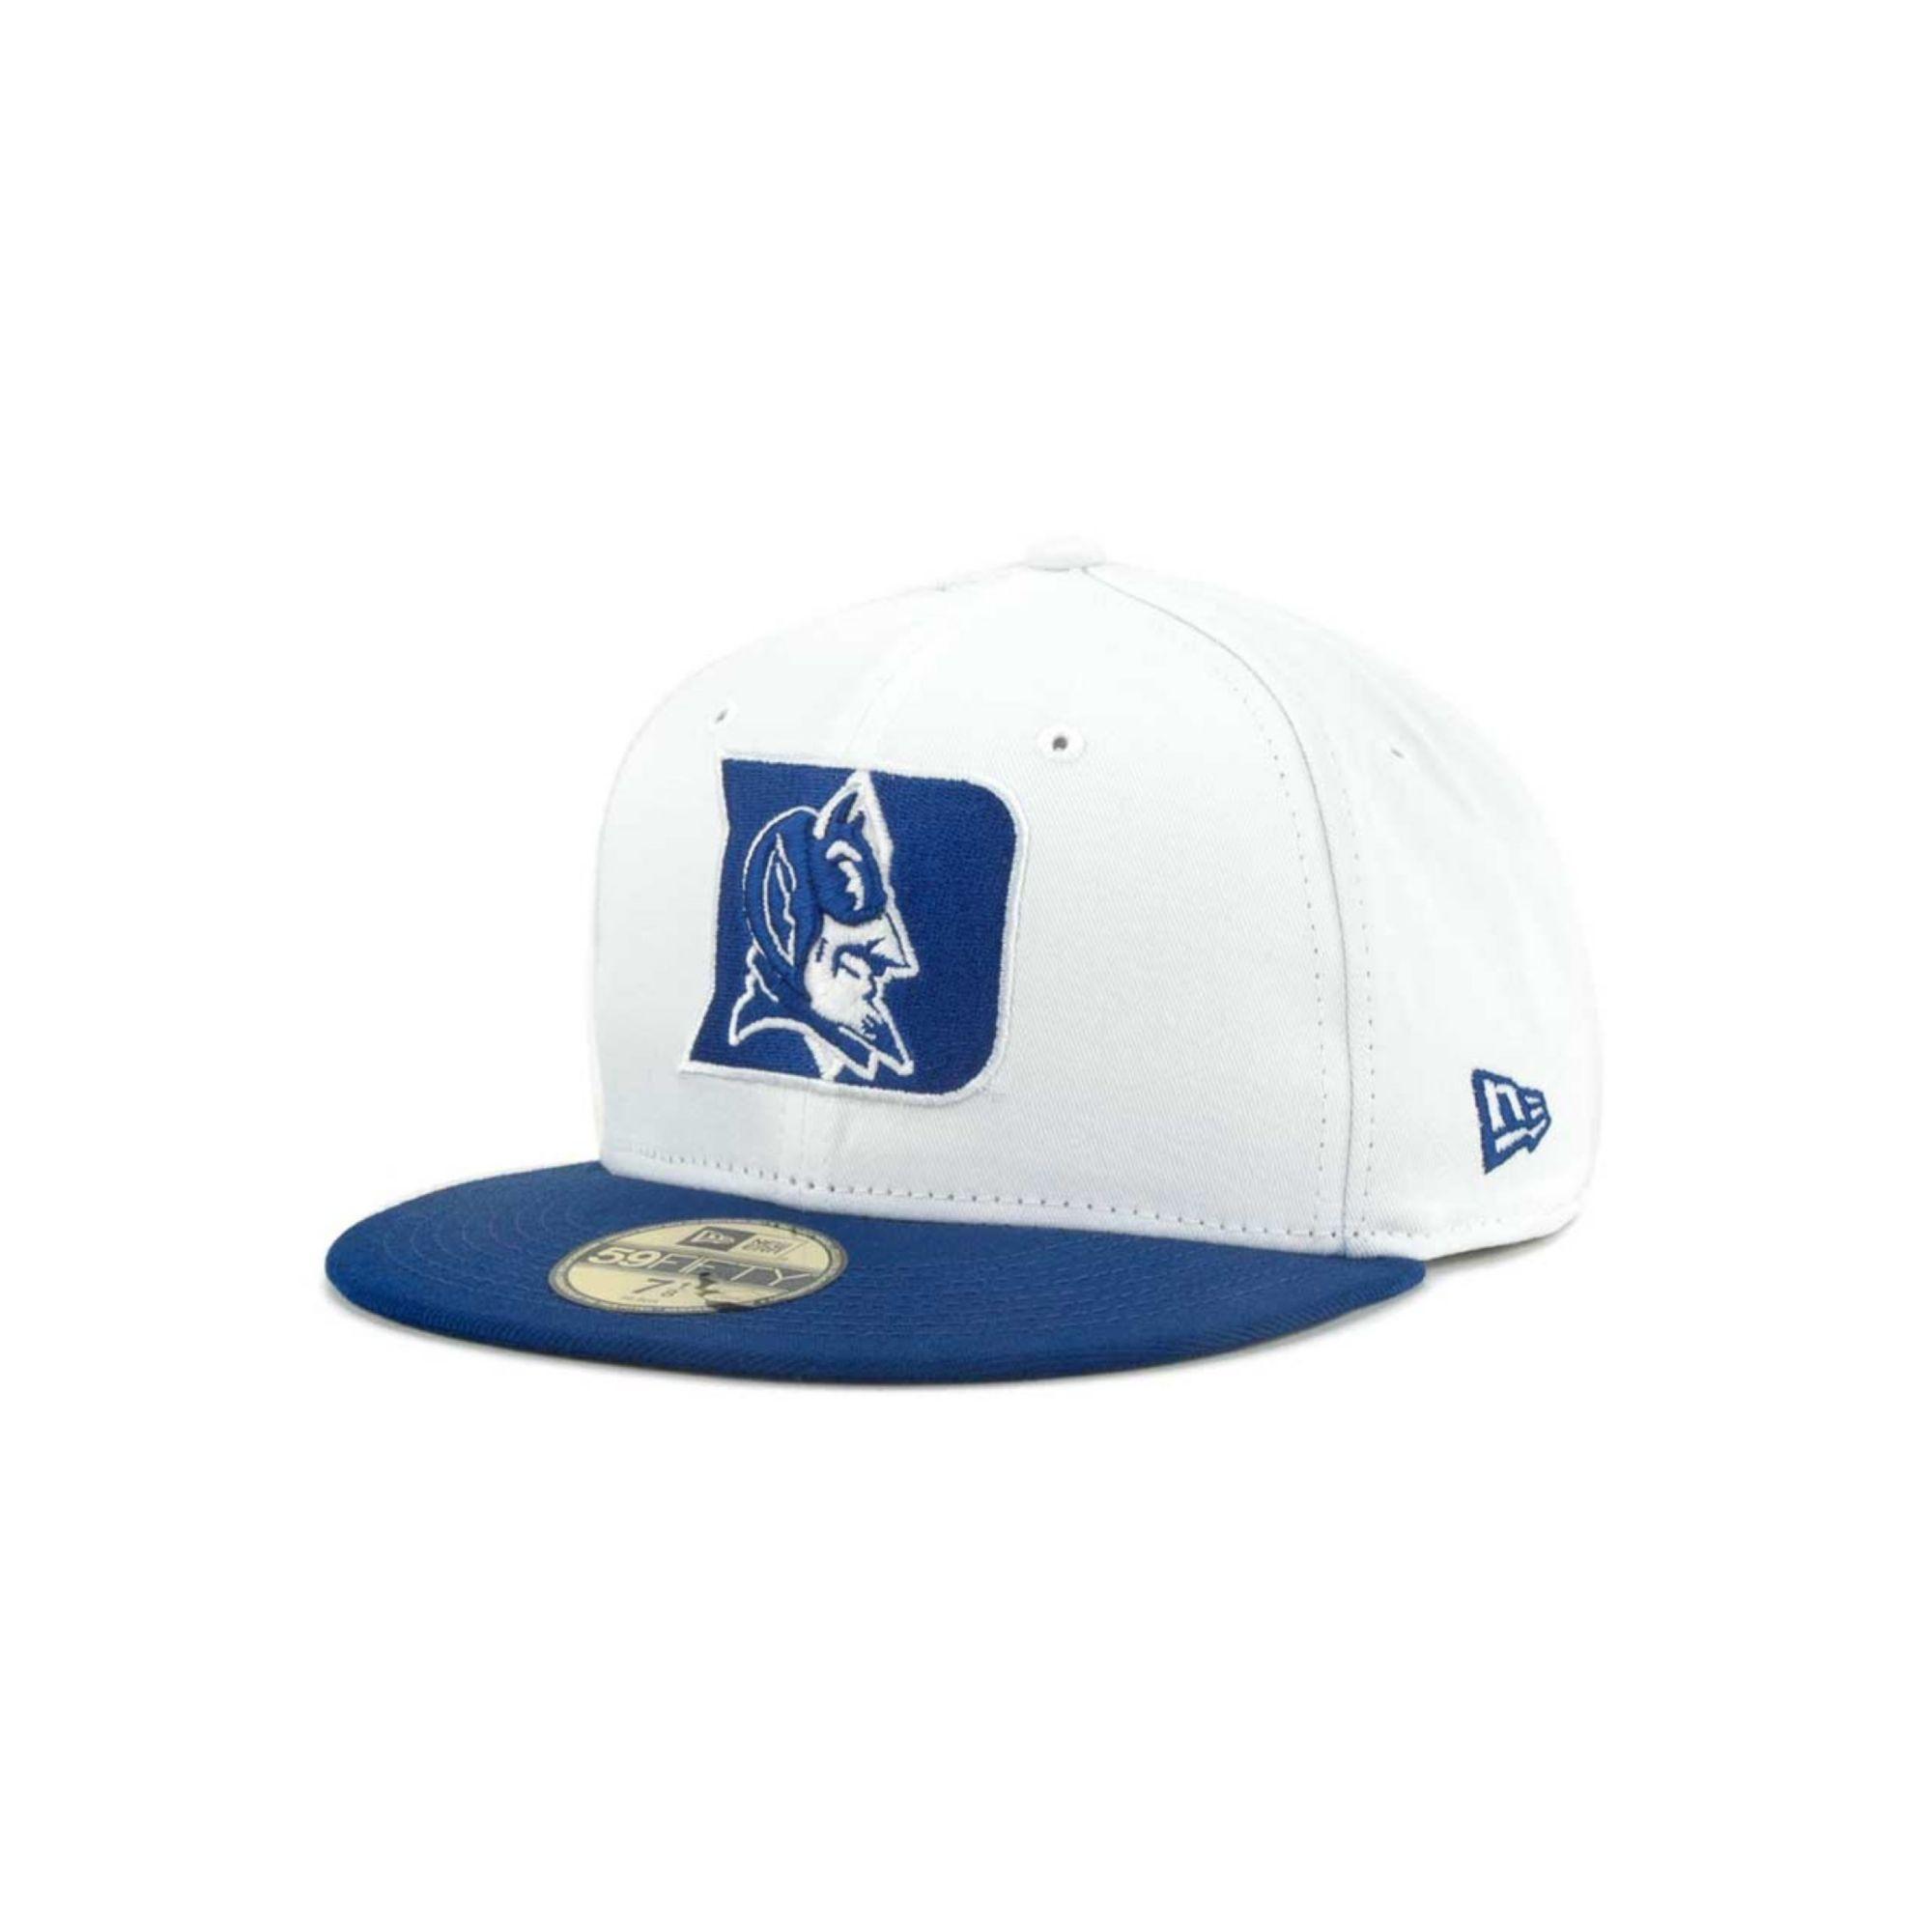 buy online cef44 8a559 KTZ Duke Blue Devils Ncaa White 2 Tone 59fifty Cap in Blue for Men ...